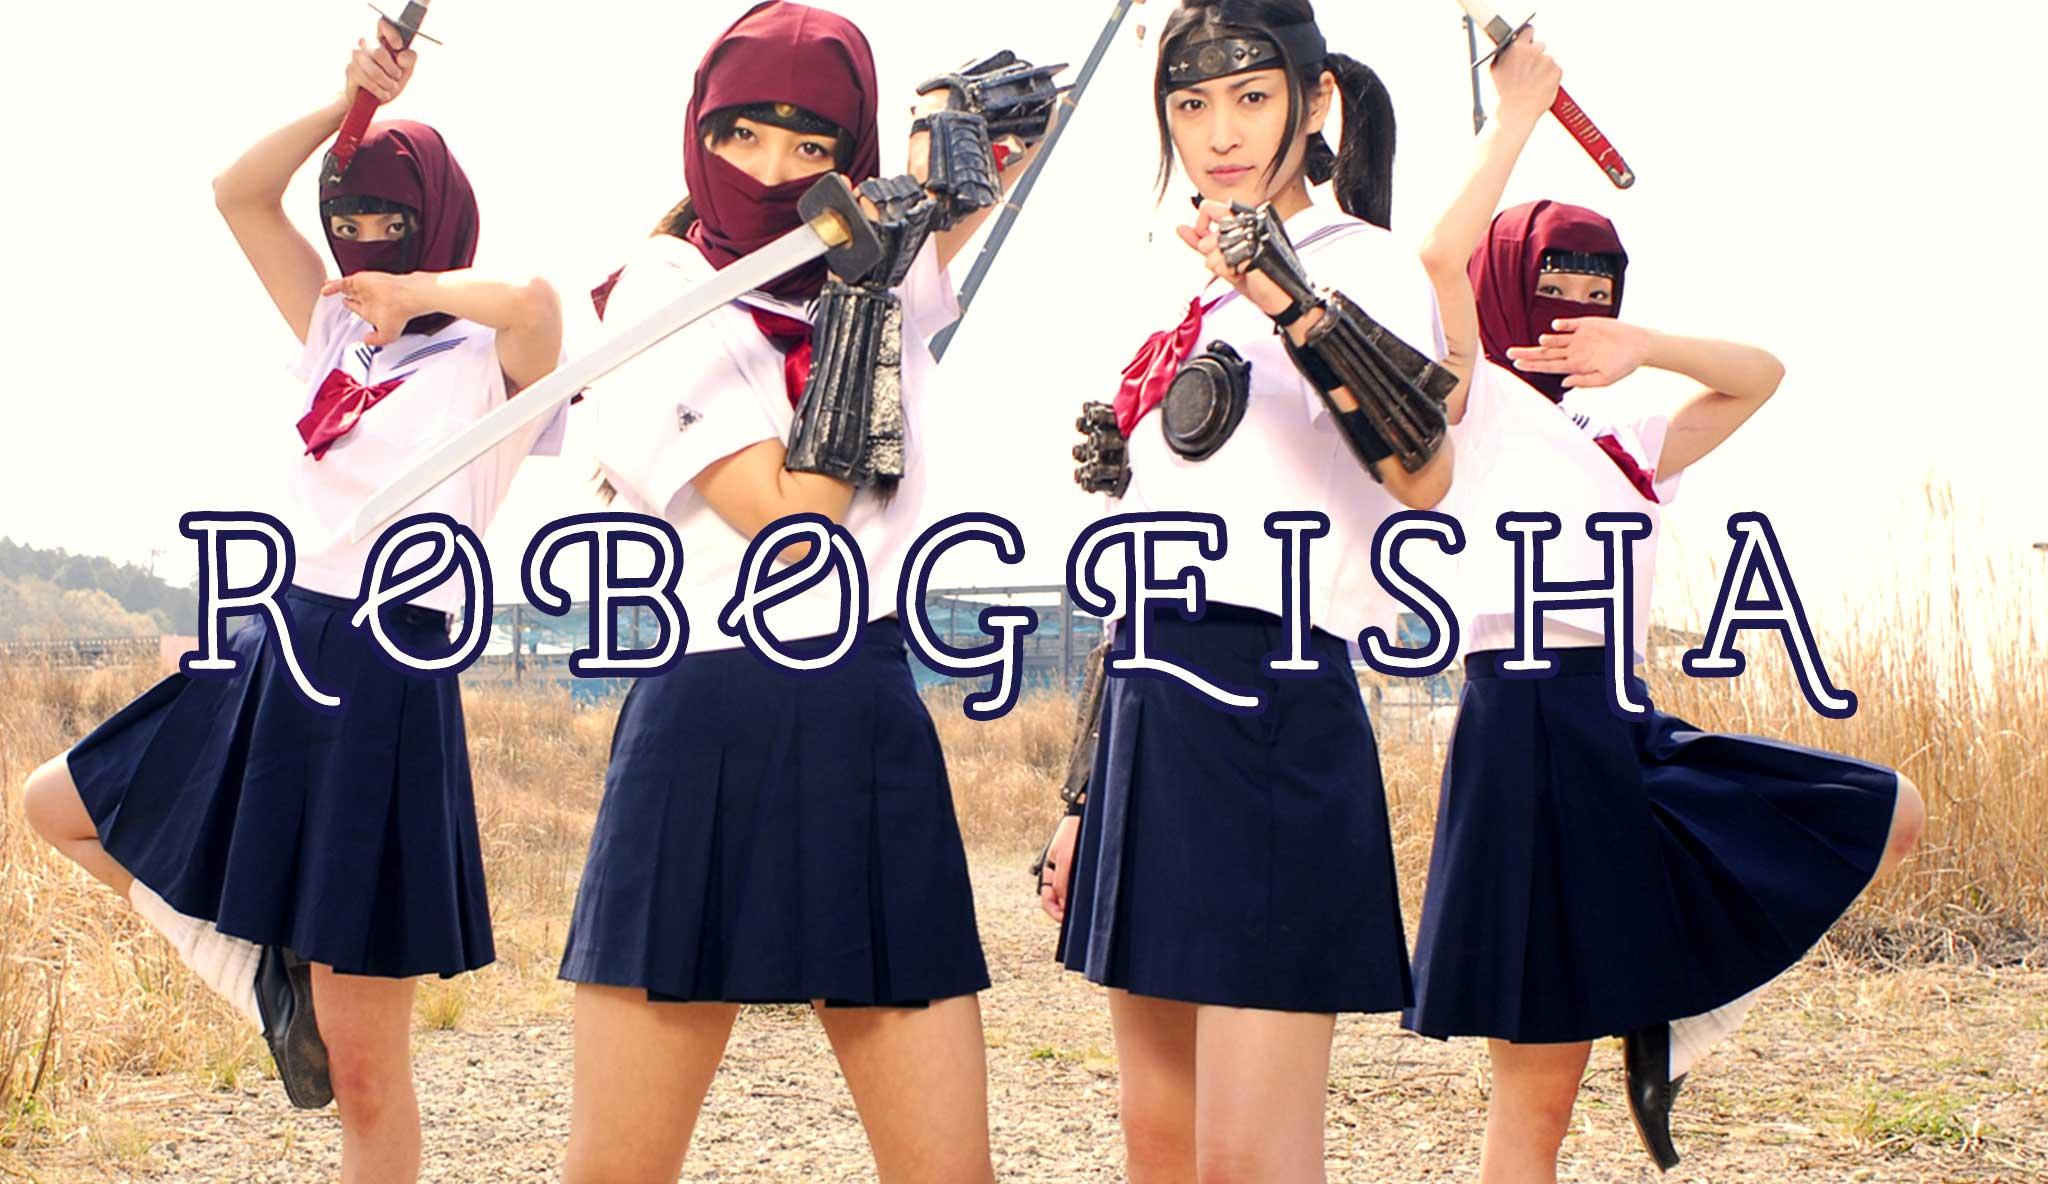 robo-geisha\header.jpg